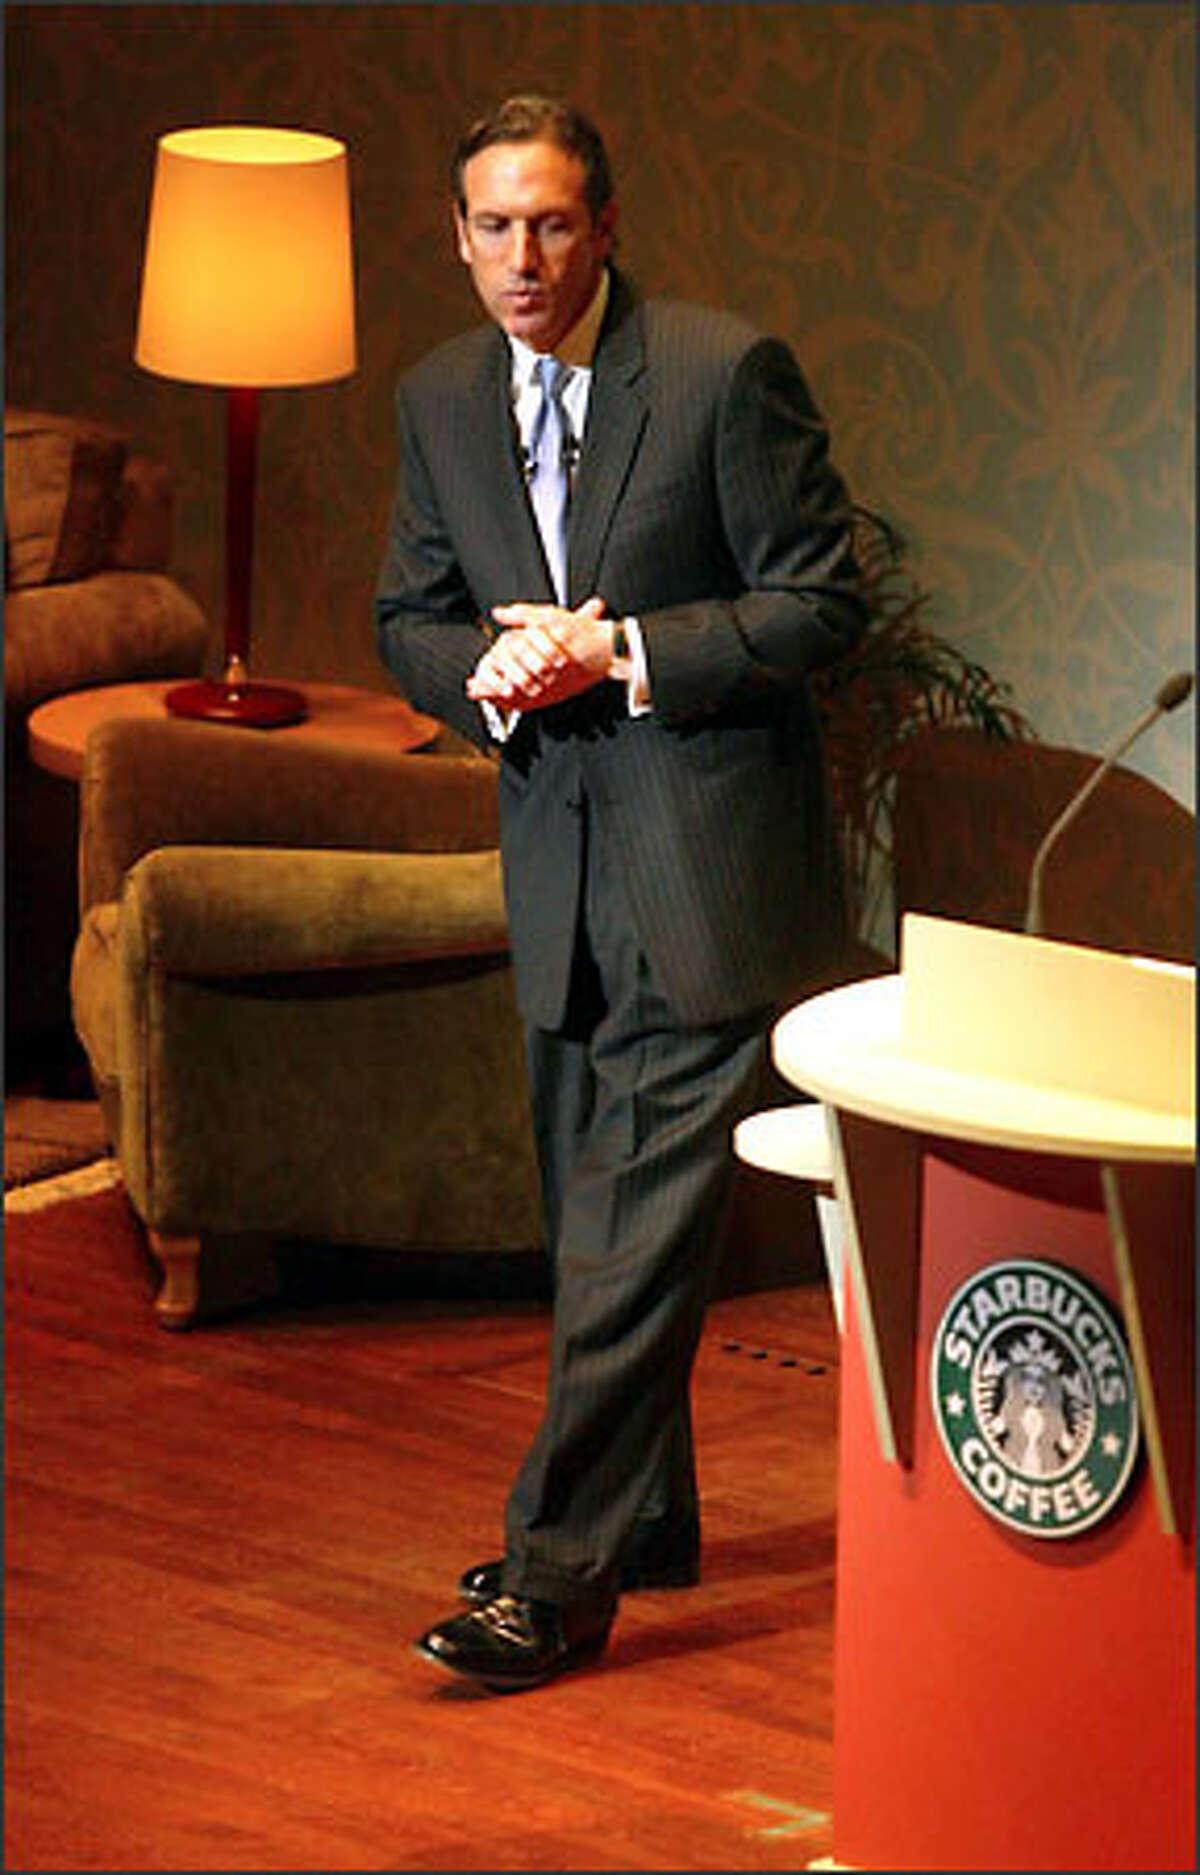 Starbucks Chairman Howard Schultz addresses shareholders at yesterday's annual meeting at Benaroya Hall.